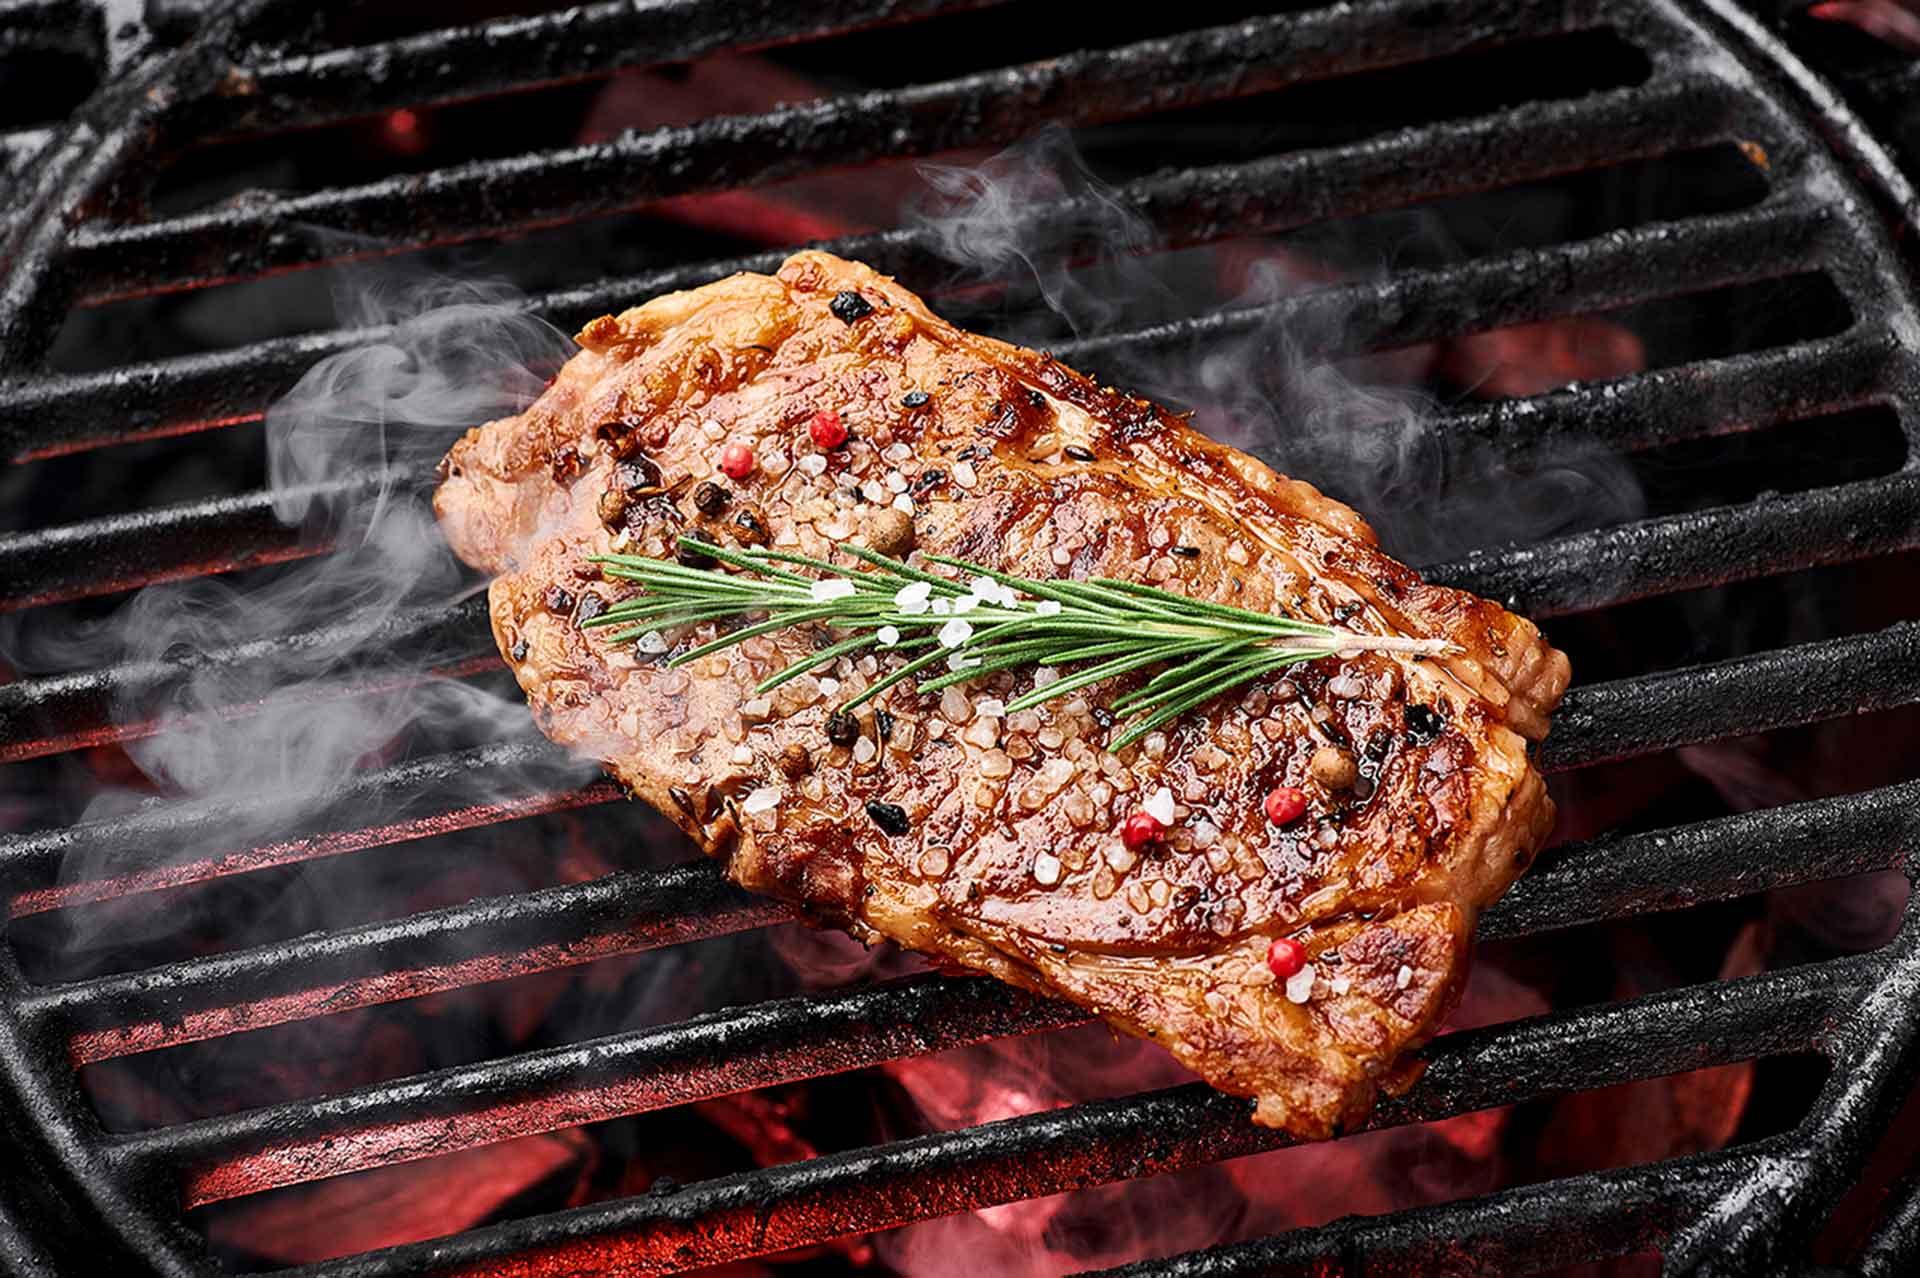 Carne ahumada